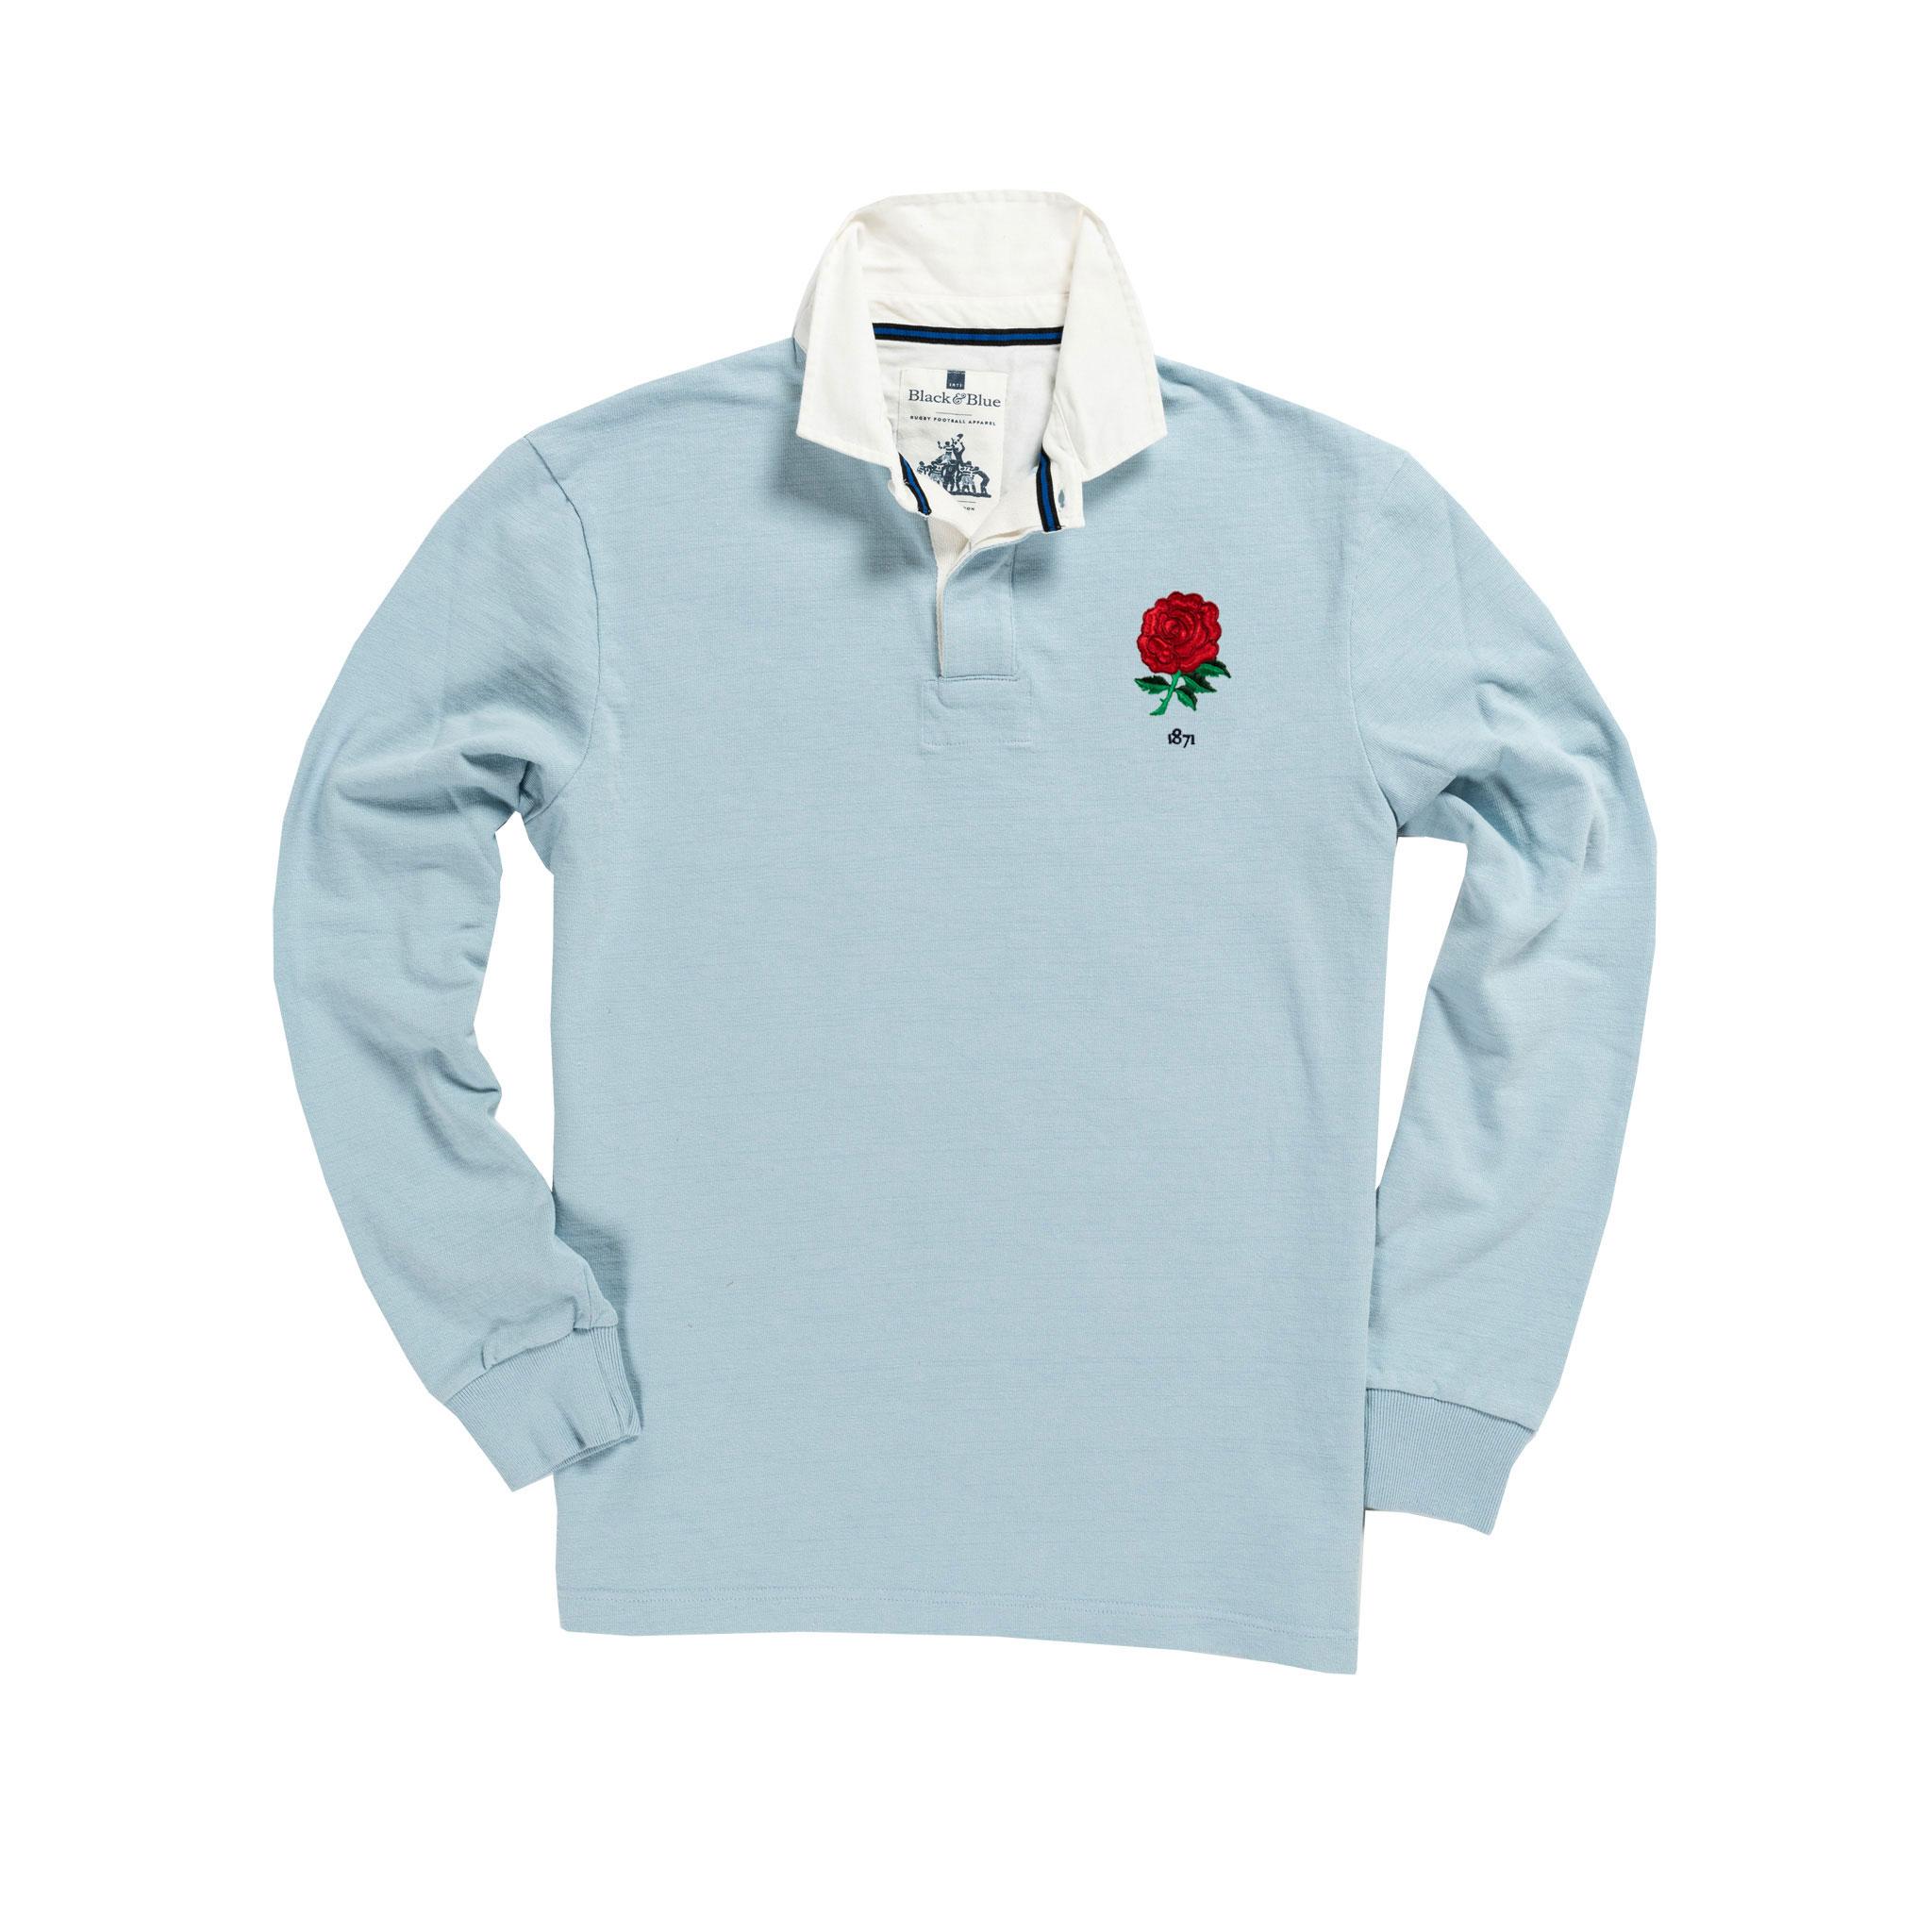 England 1871 Sky Blue Vintage Rugby Shirt